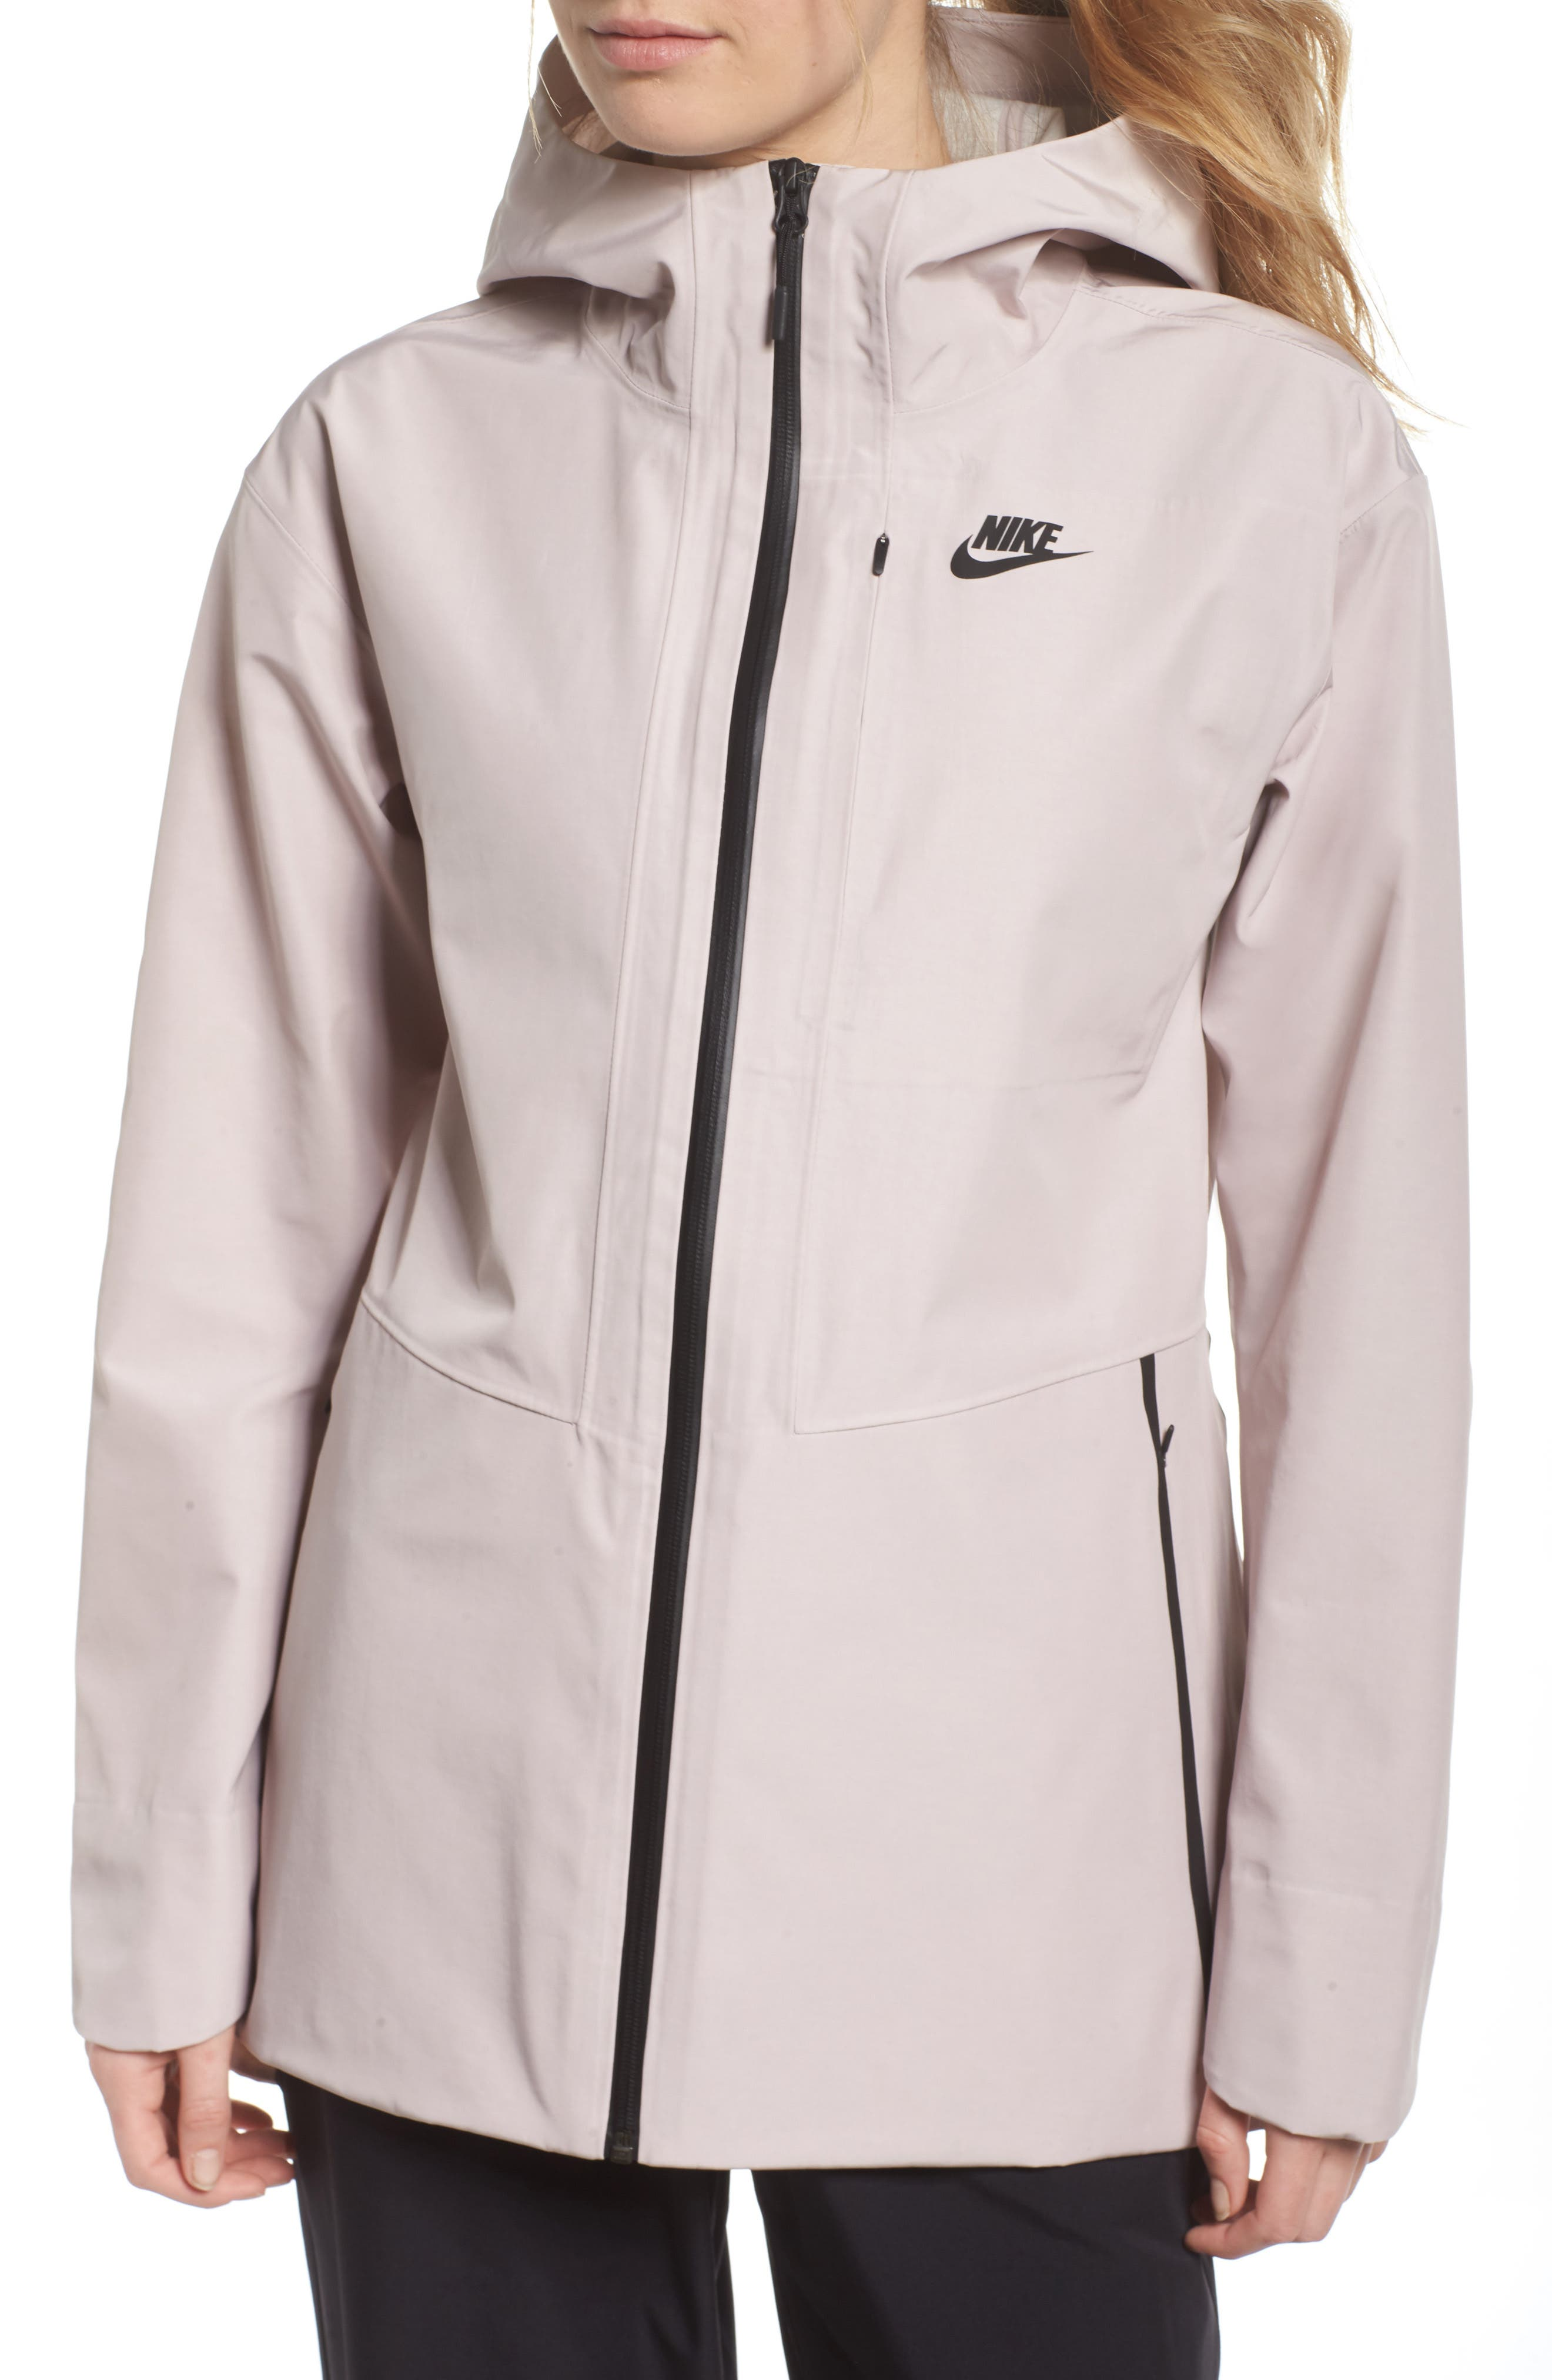 Sportswear Women's Tech Jacket,                             Alternate thumbnail 4, color,                             Particle Rose/ Black